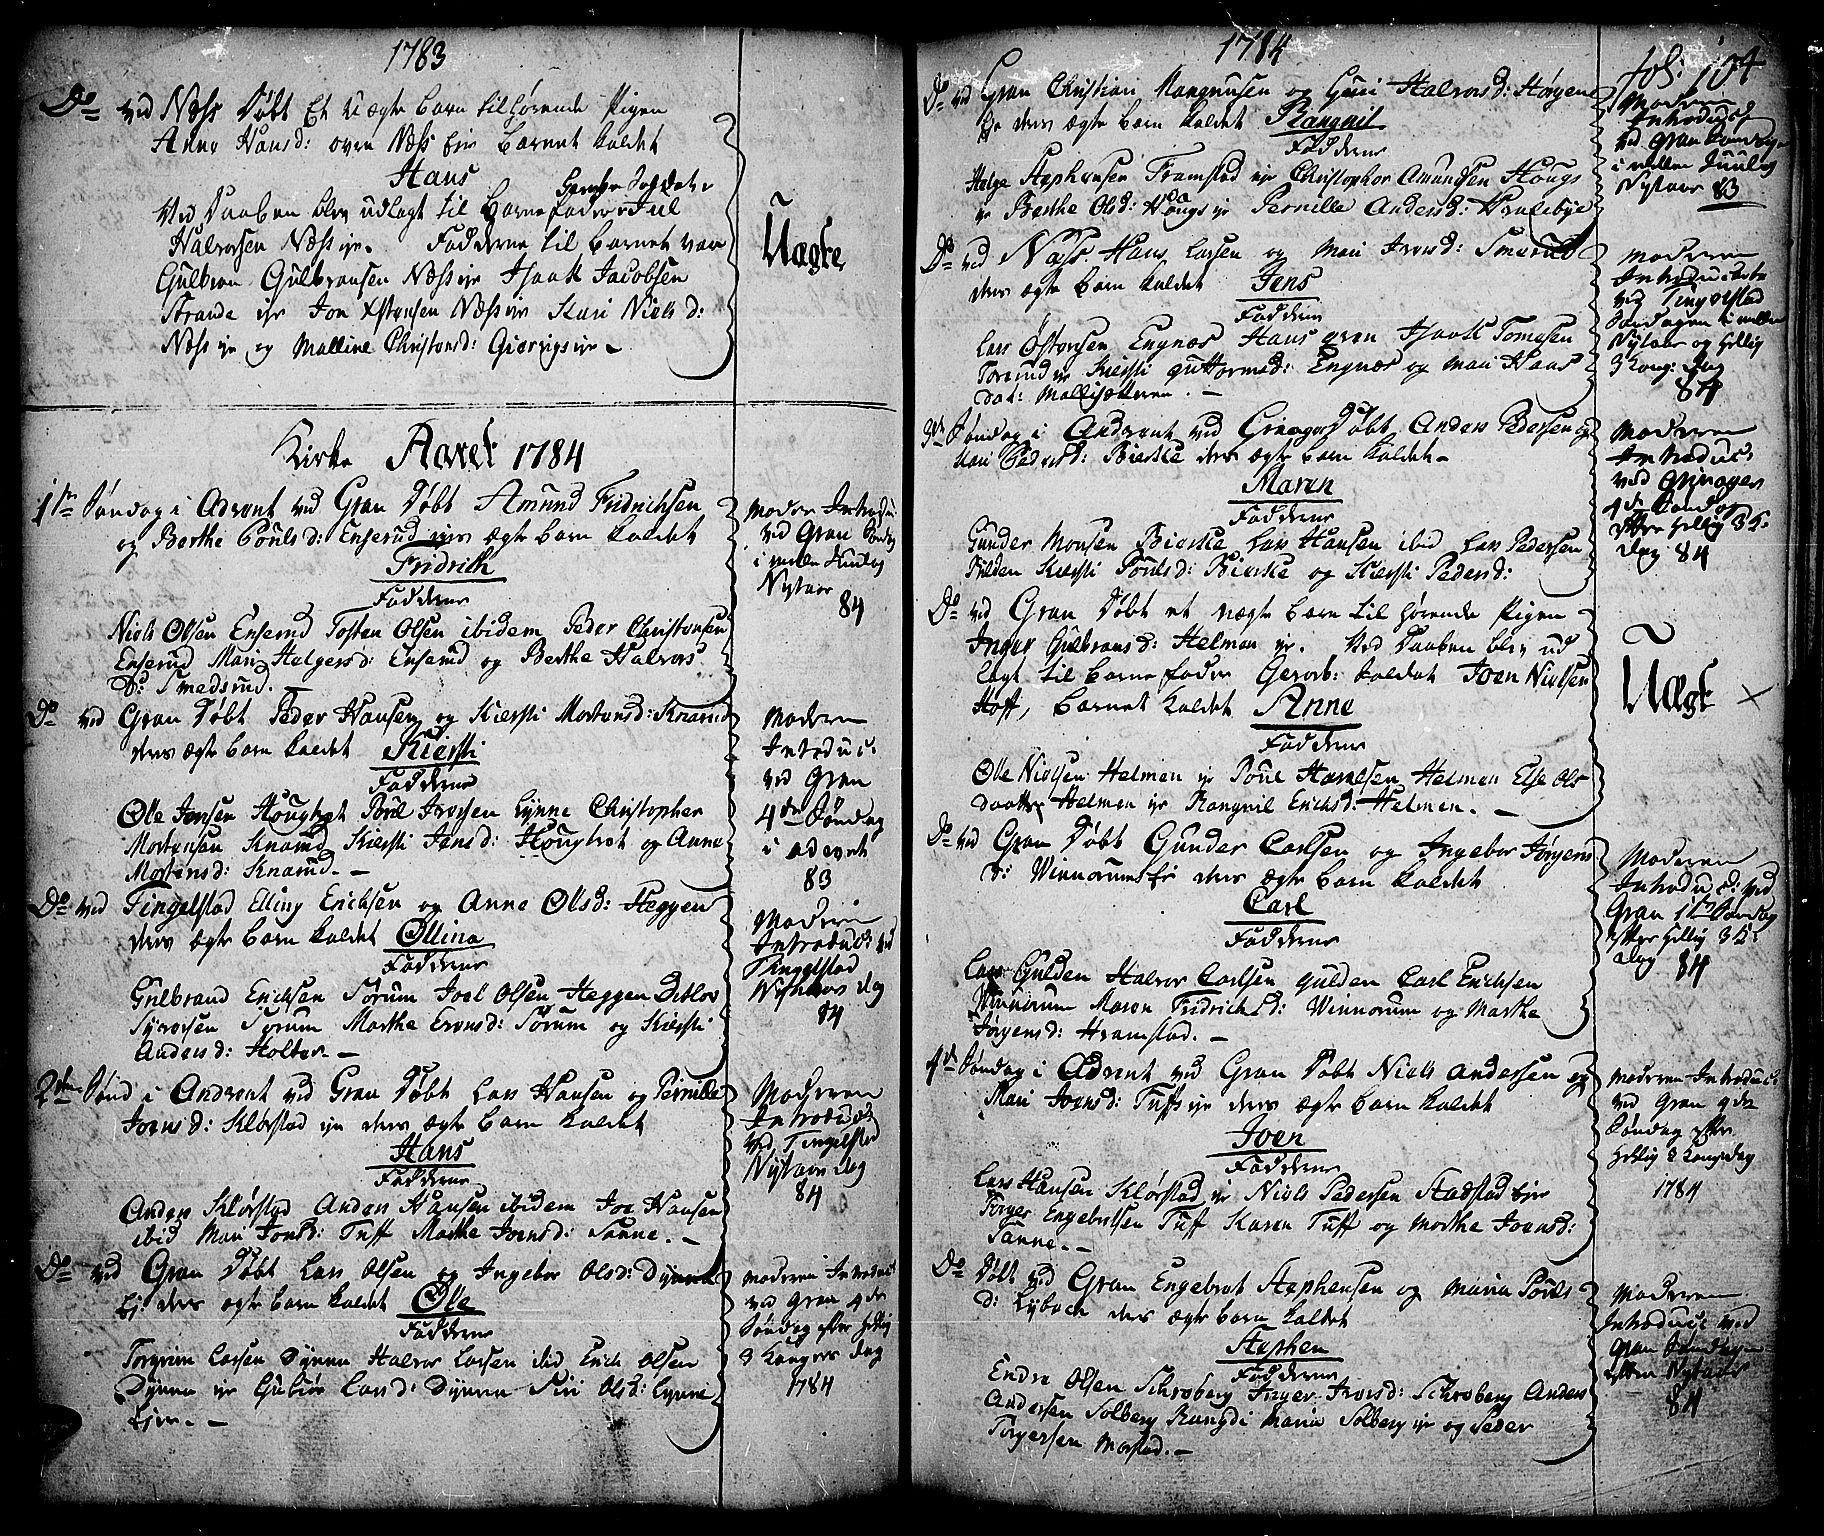 SAH, Gran prestekontor, Ministerialbok nr. 5, 1776-1788, s. 104